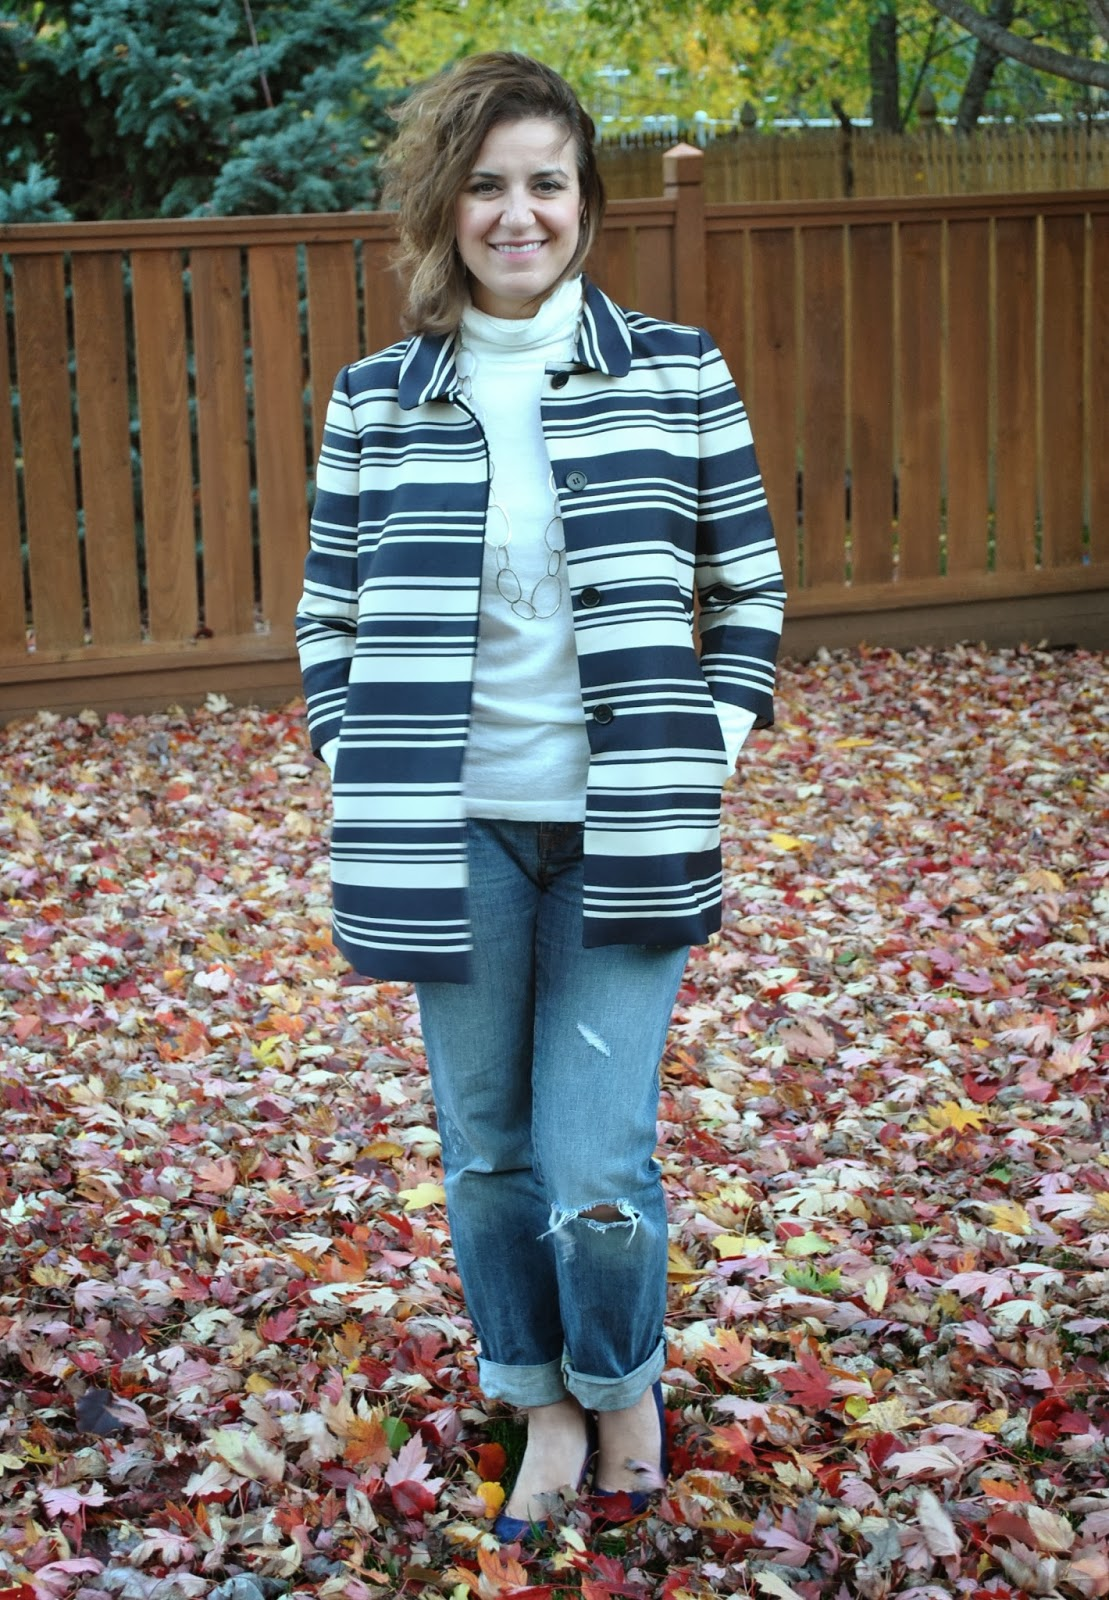 http://akstylemyway.blogspot.com/2013/11/so-much-love.html